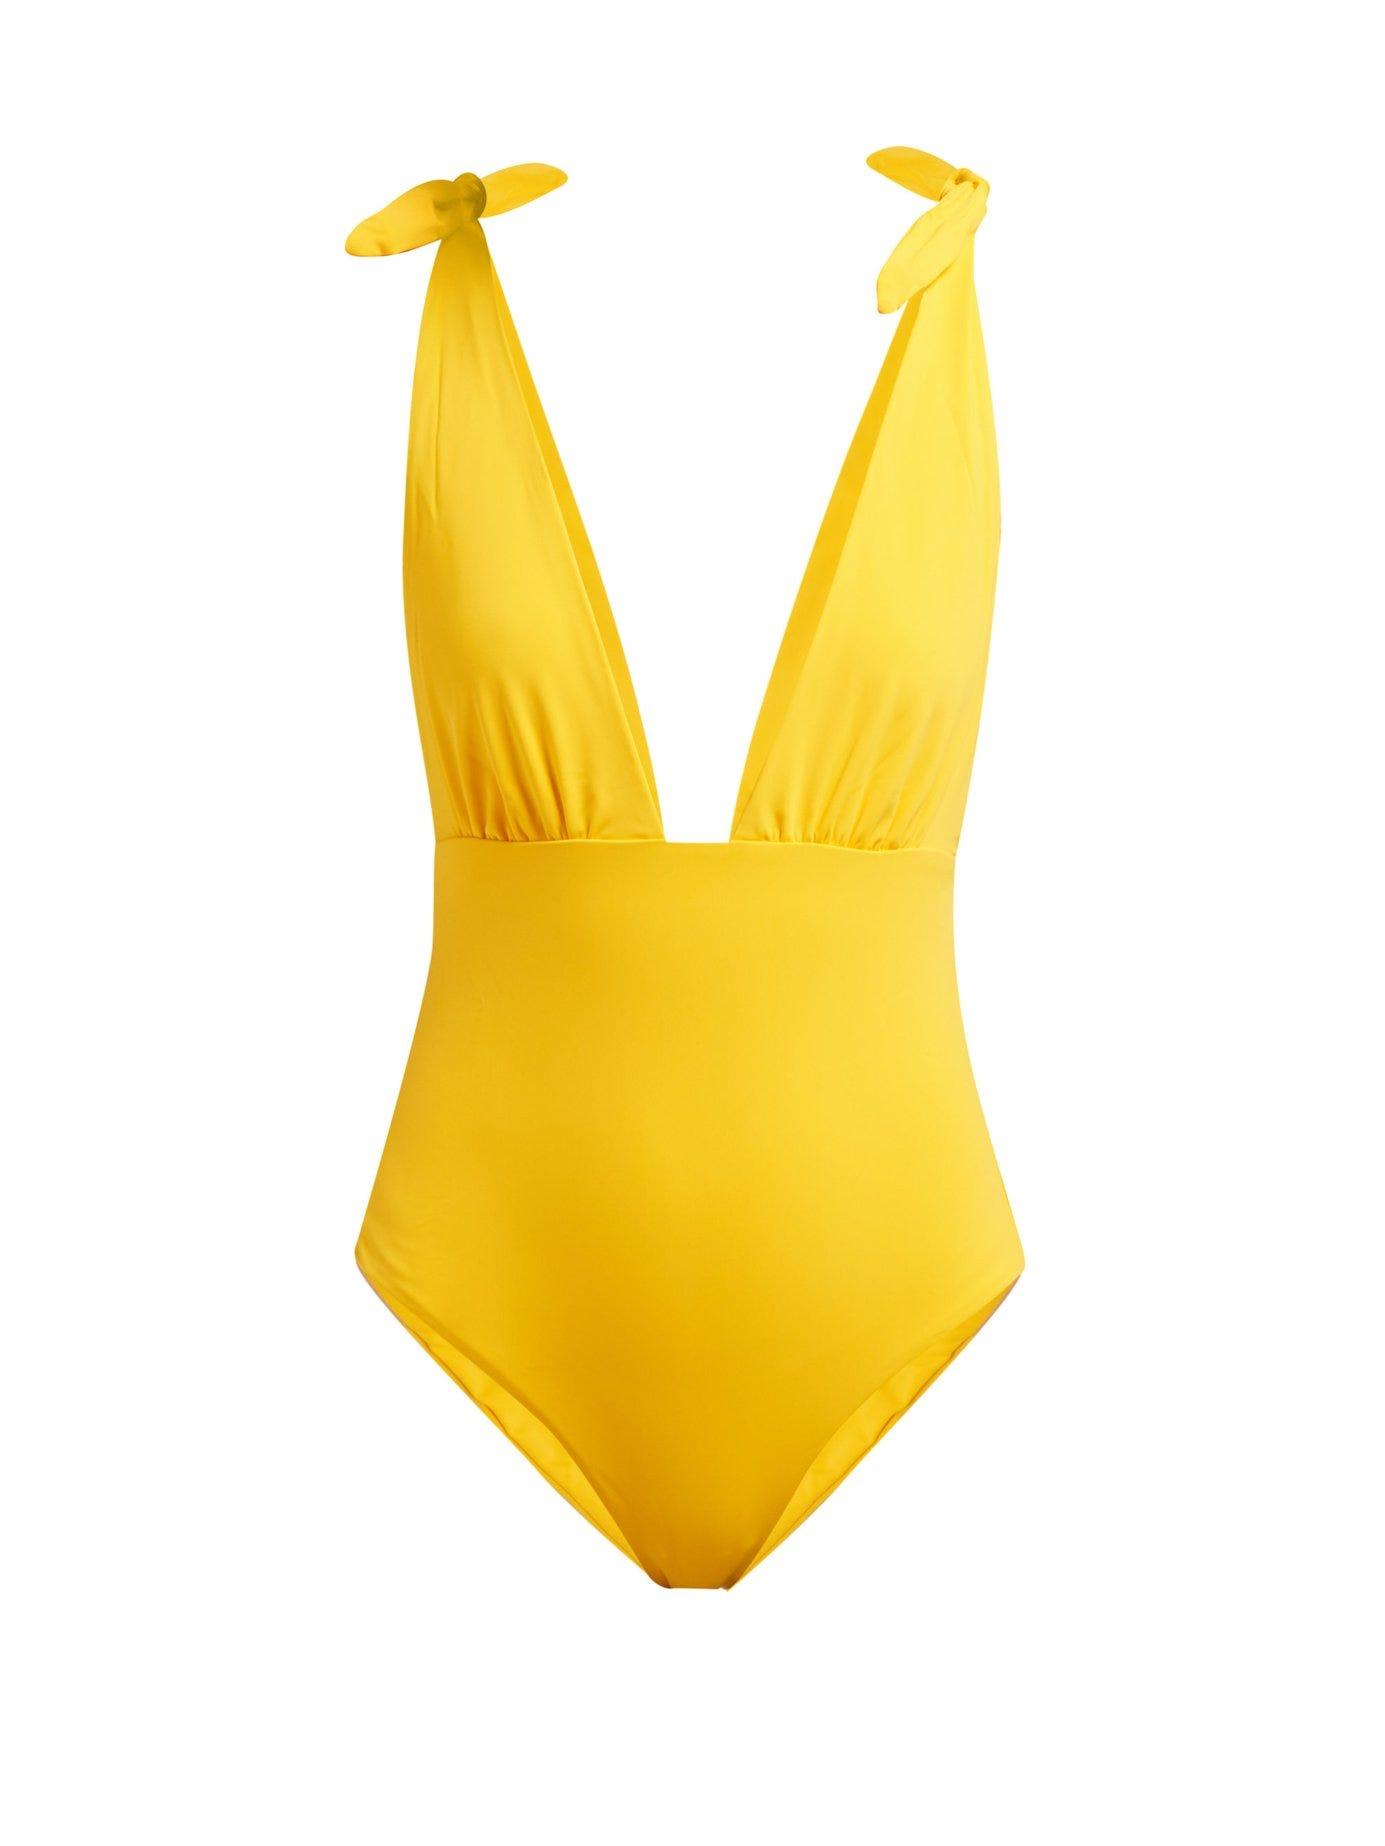 eeef9b93628 Best Recycled Sustainable Swimwear UK 2019